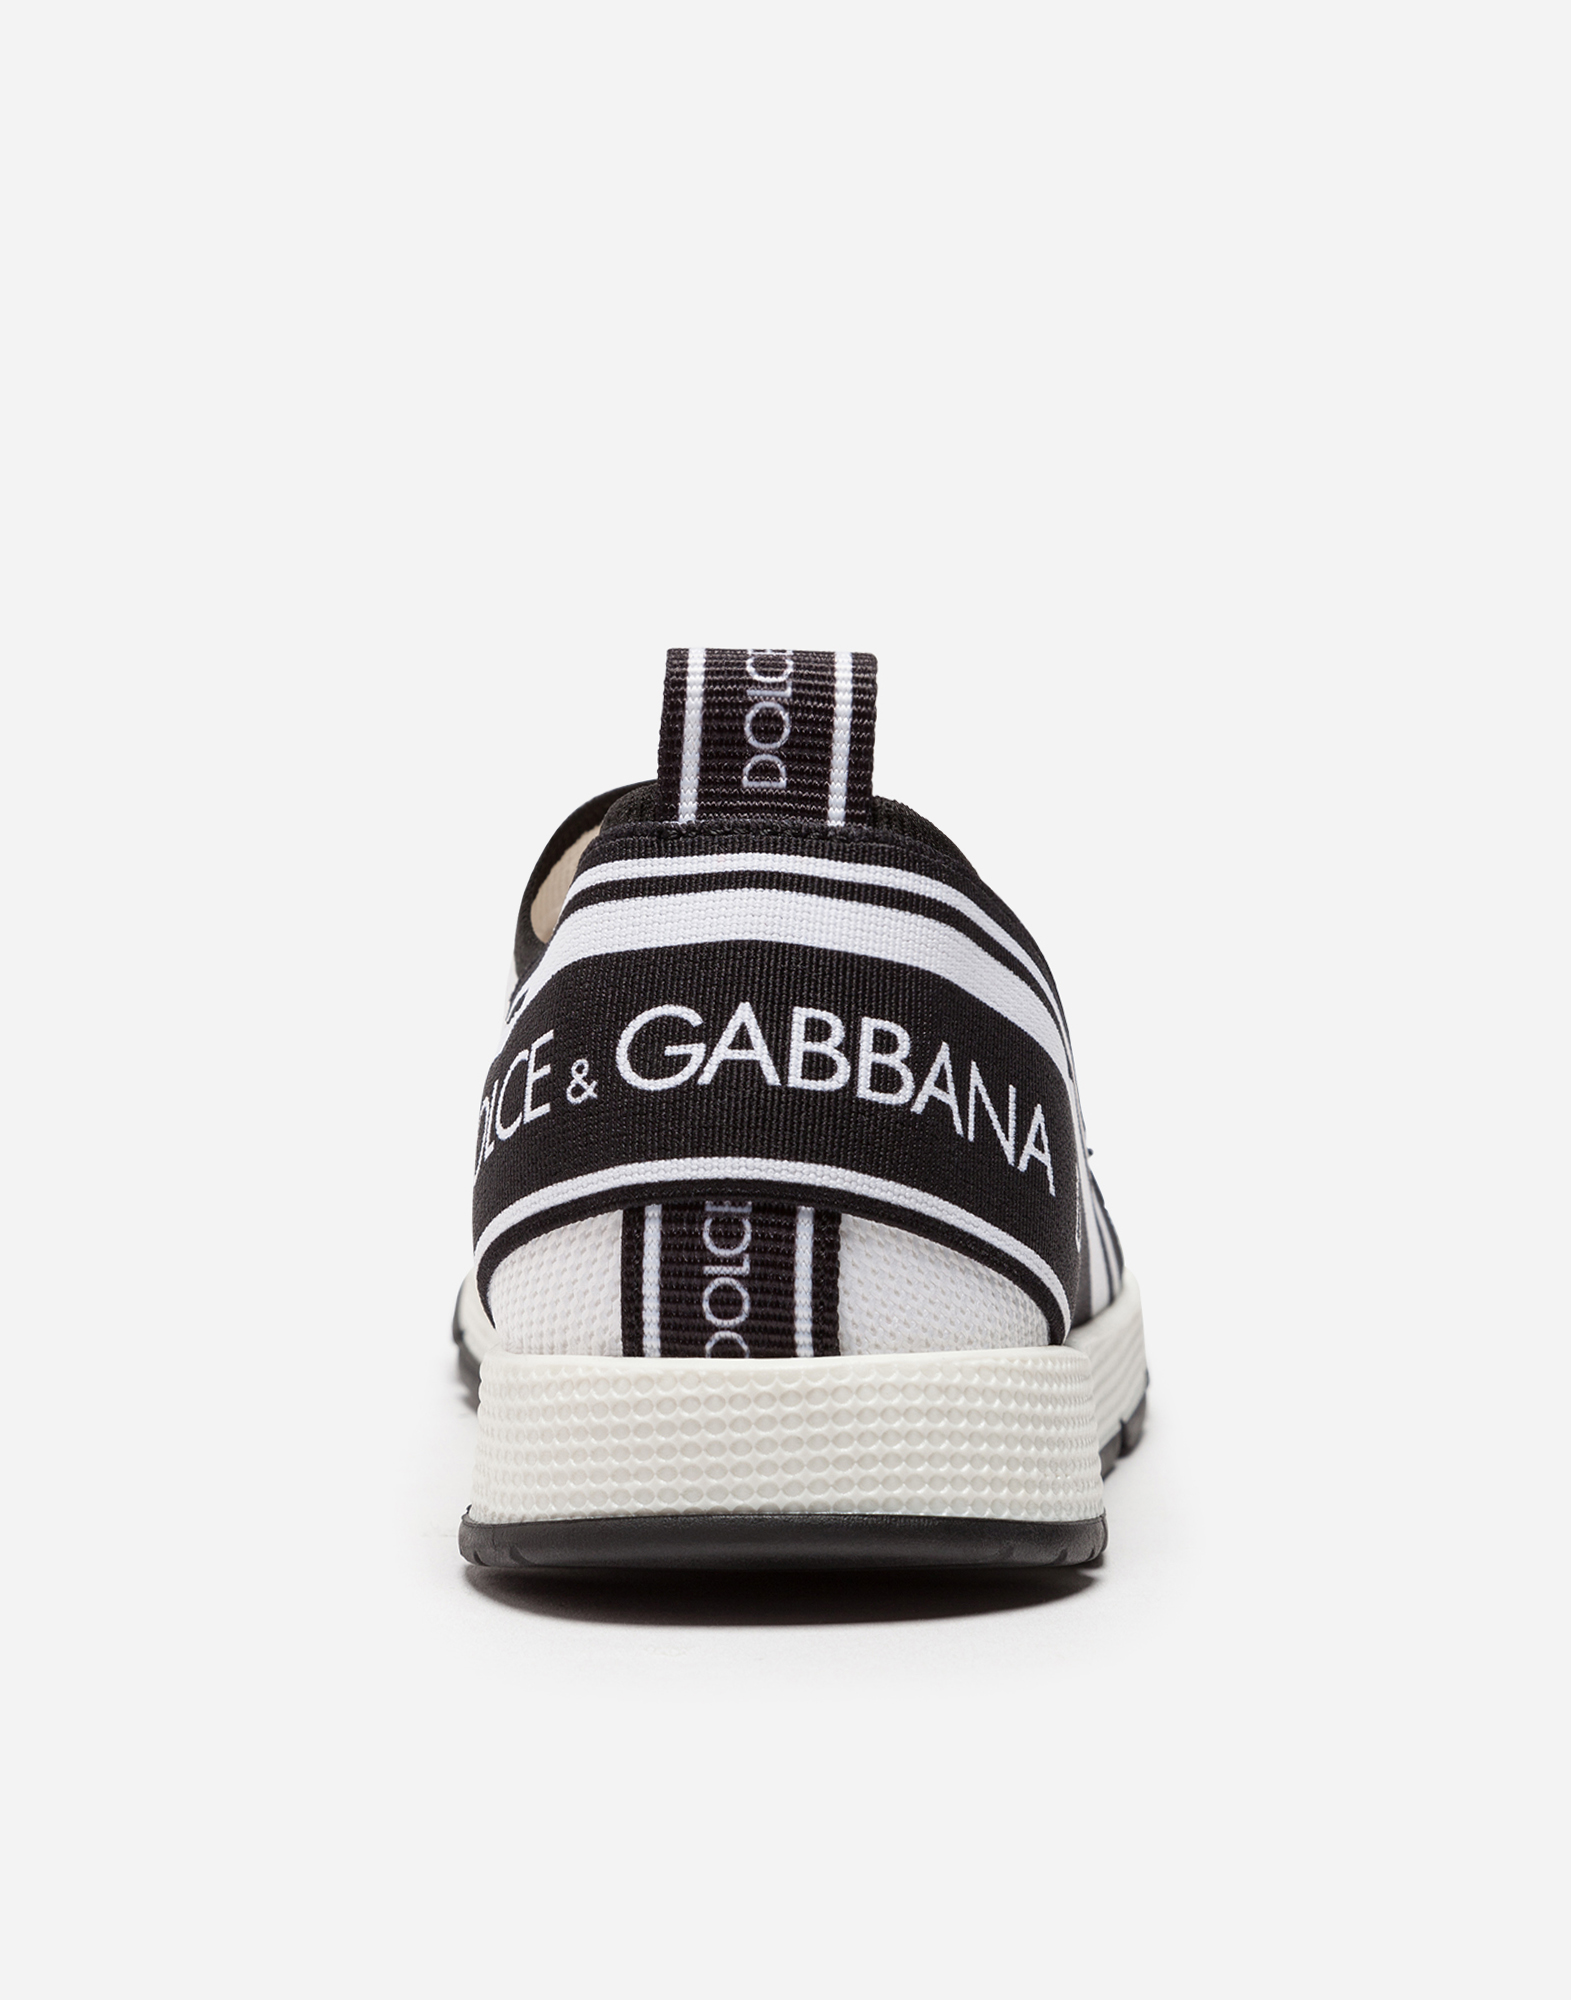 Dolce & Gabbana NEOPRENE SLIP-ON SNEAKERS